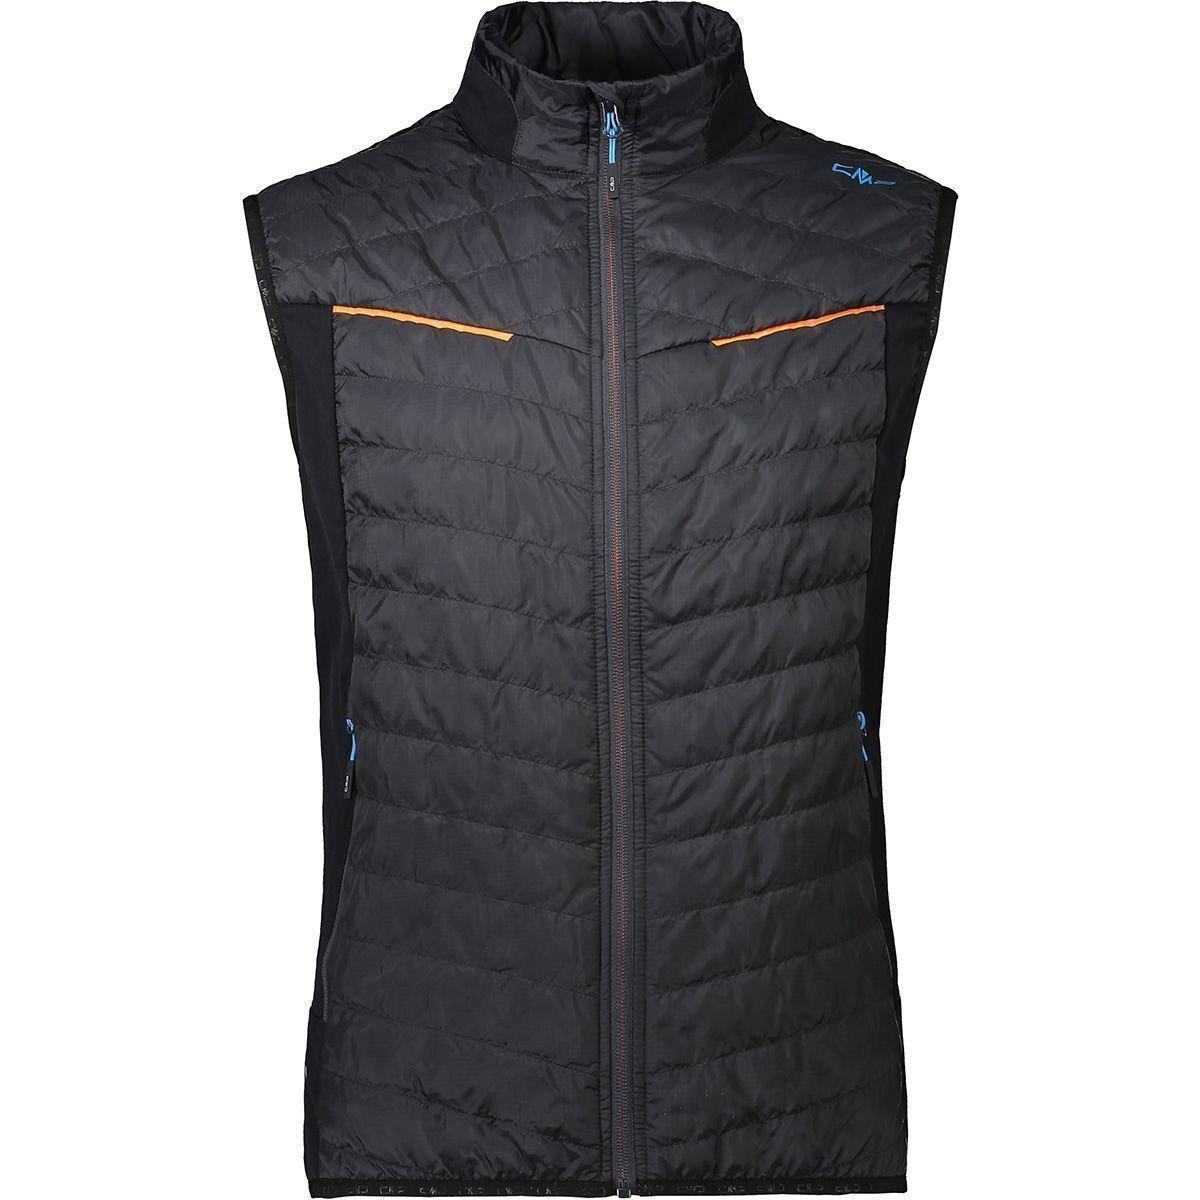 Hybrid Vest Extralight WR